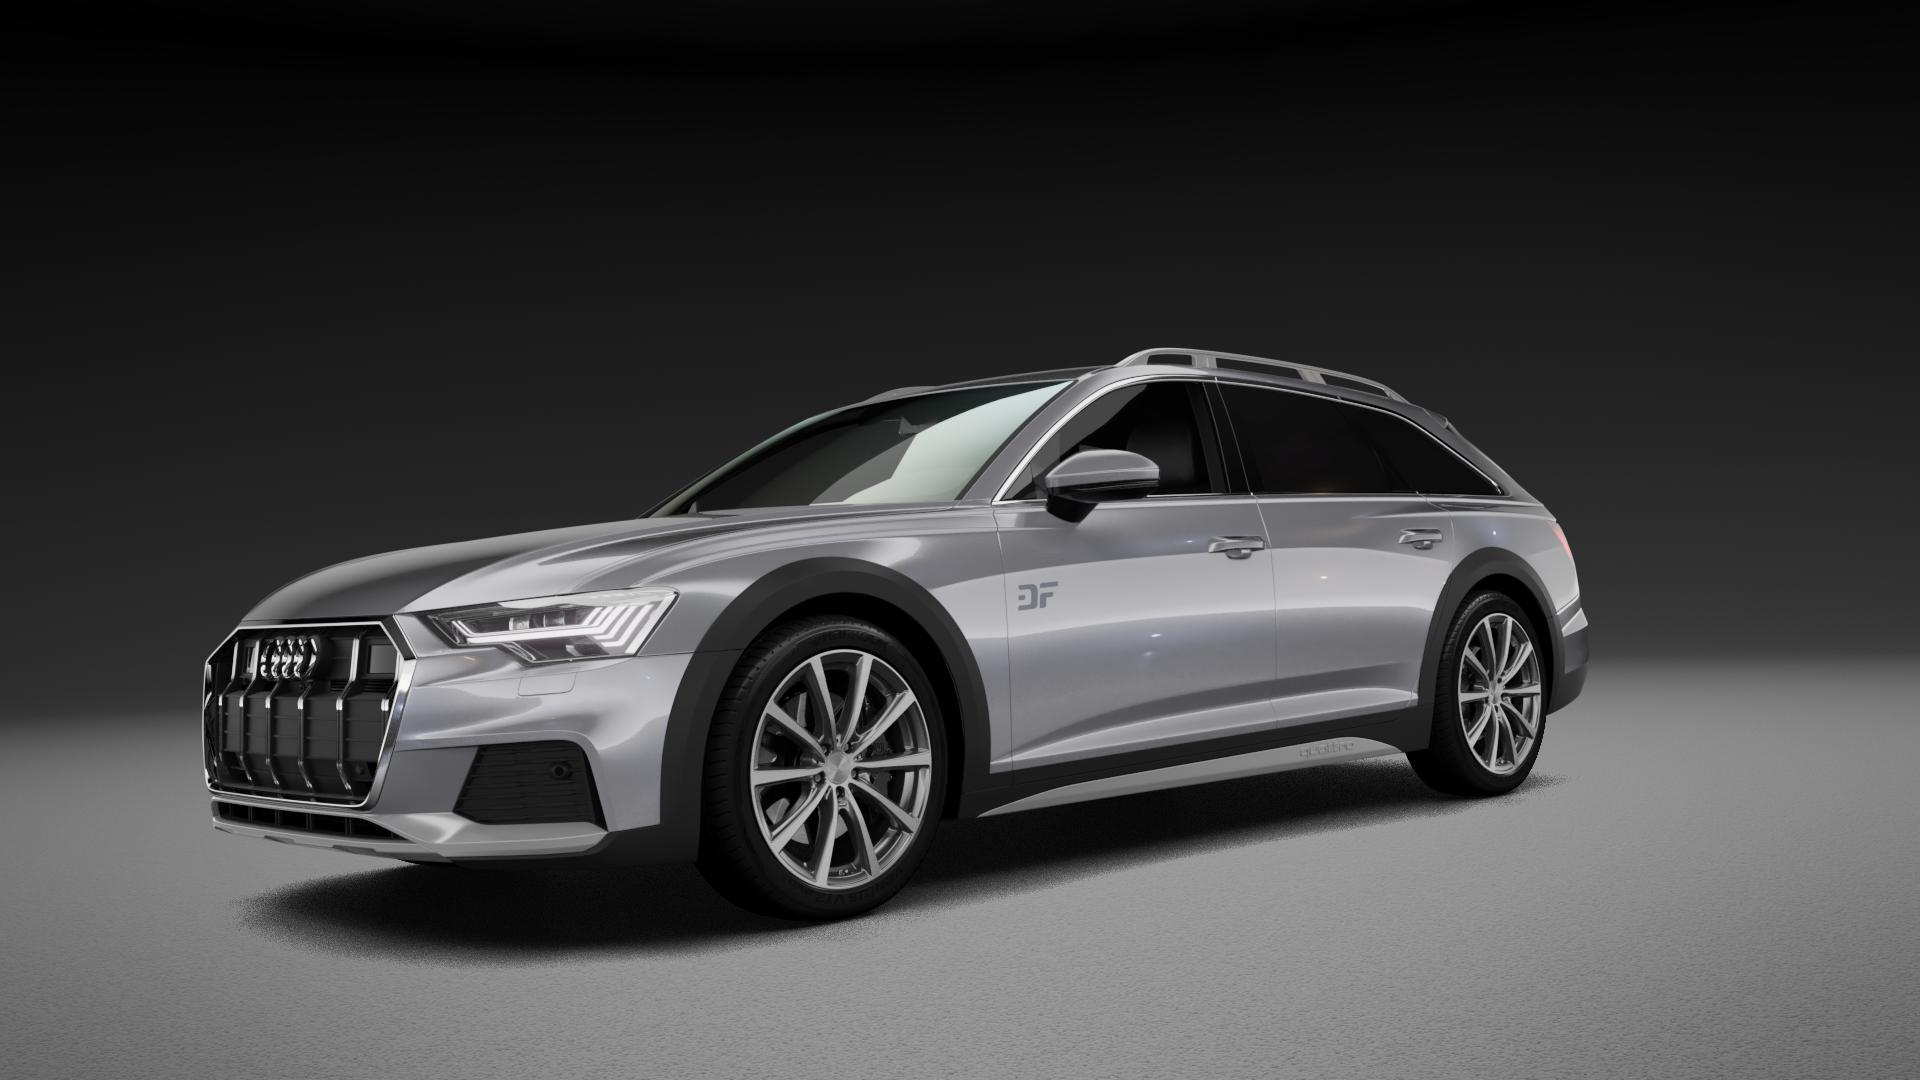 Brock B32 himalaya-grey front-poliert Felge mit Reifen grau mehrfarbig in 20Zoll Alufelge auf silbernem Audi A6 Allroad Quattro Typ F2/C8 ⬇️ mit 15mm Tieferlegung ⬇️ Neutral_mid_max5300mm Frontansicht_1